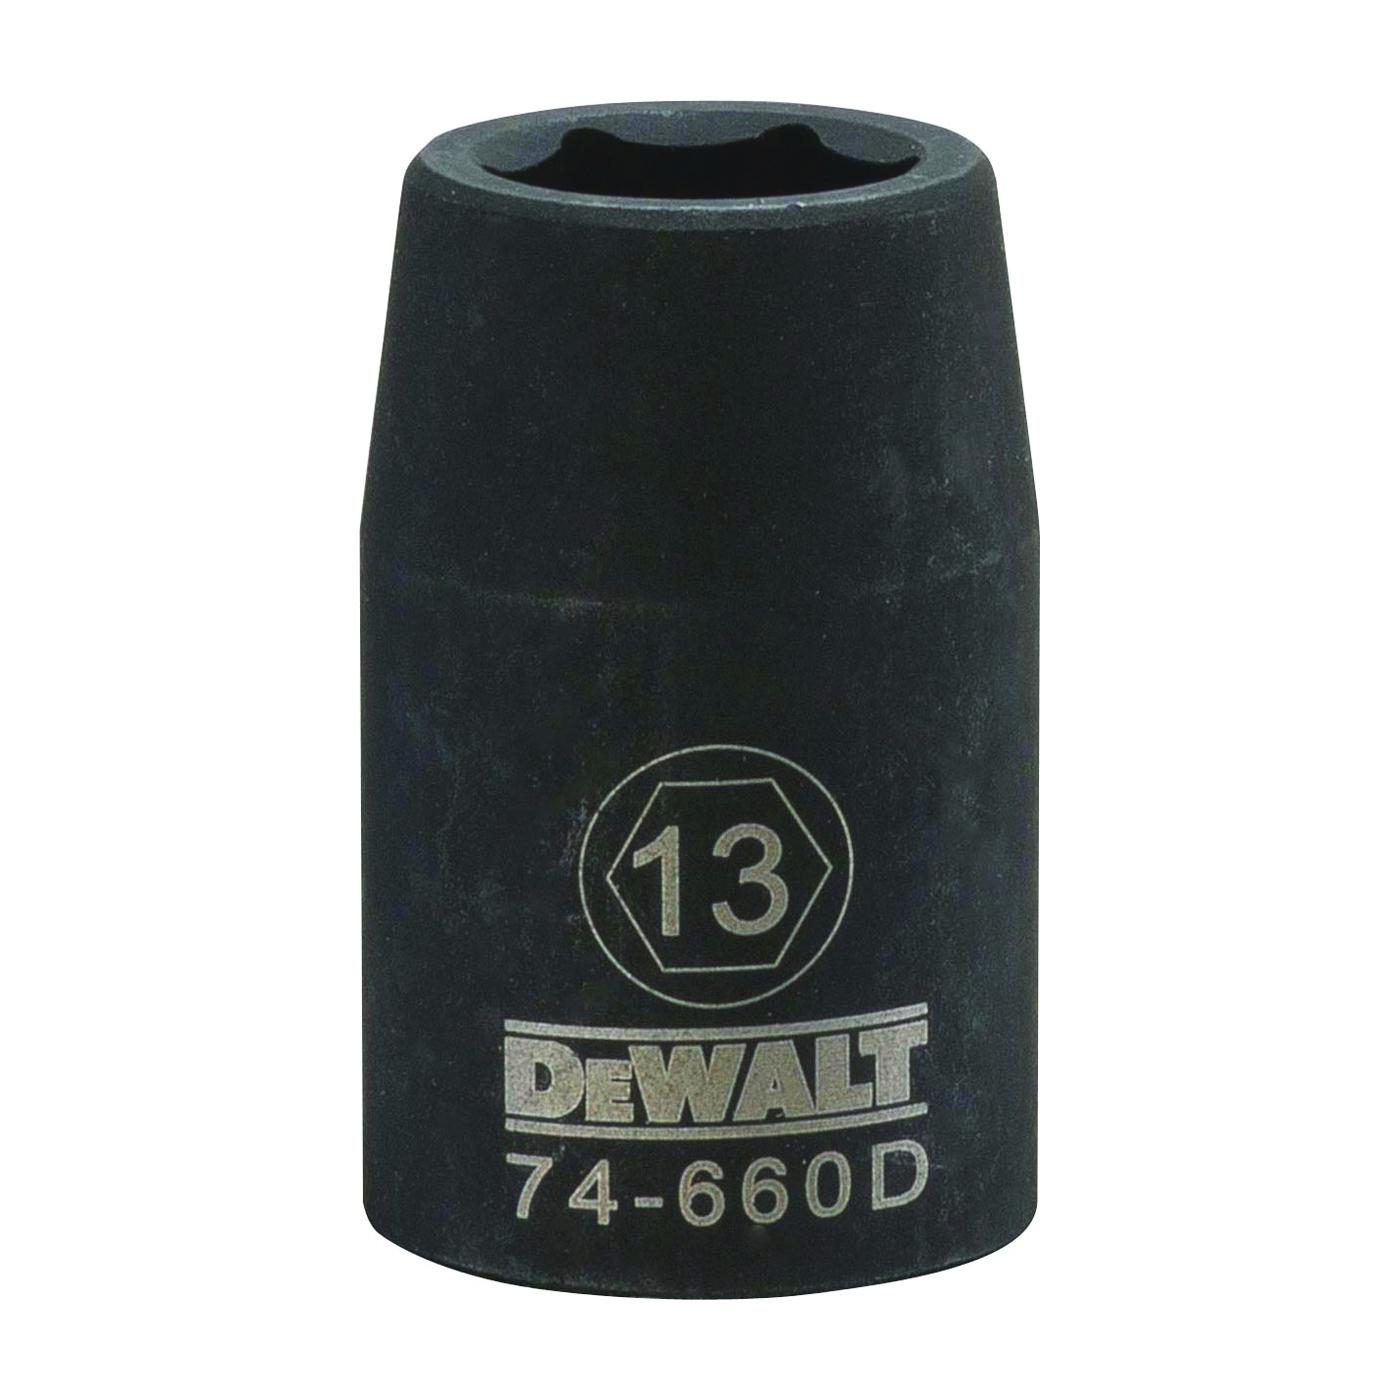 Picture of DeWALT DWMT74660OSP Impact Socket, 13 mm Socket, 1/2 in Drive, 6 -Point, CR-440 Steel, Black Oxide